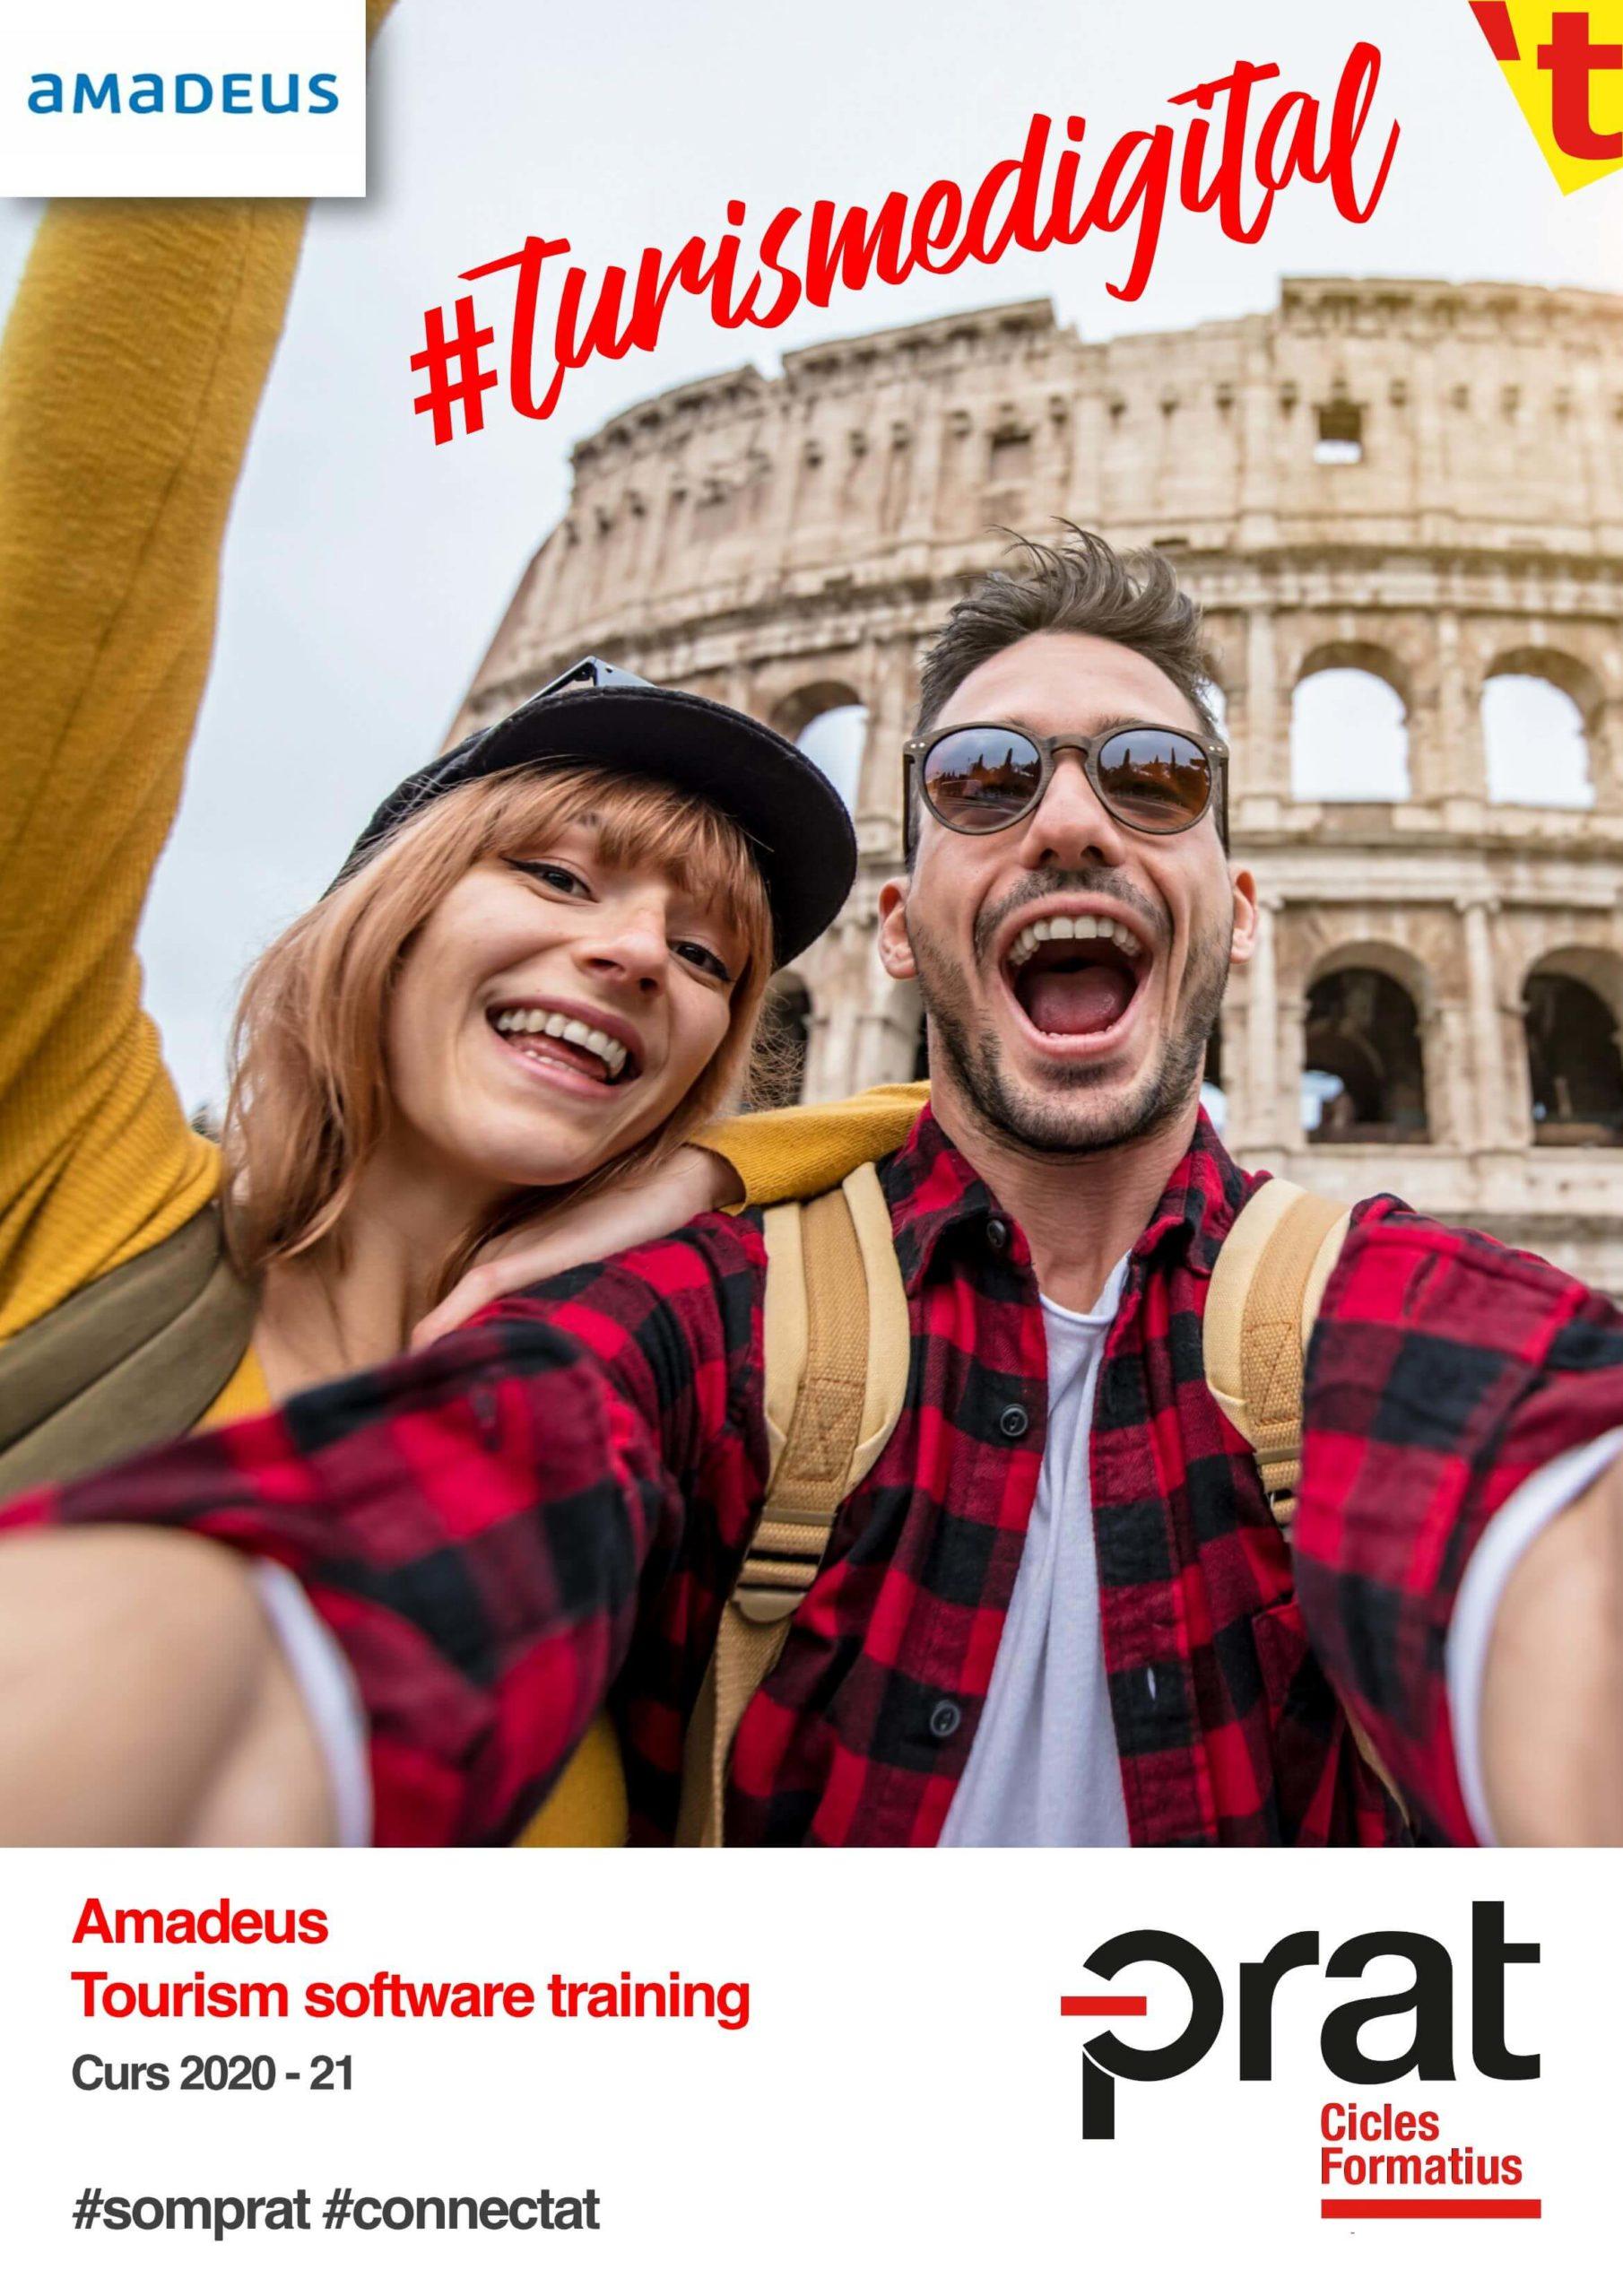 Amadeus Tourism software training - Cicles Formatius de Grau Superior a Prat Educació